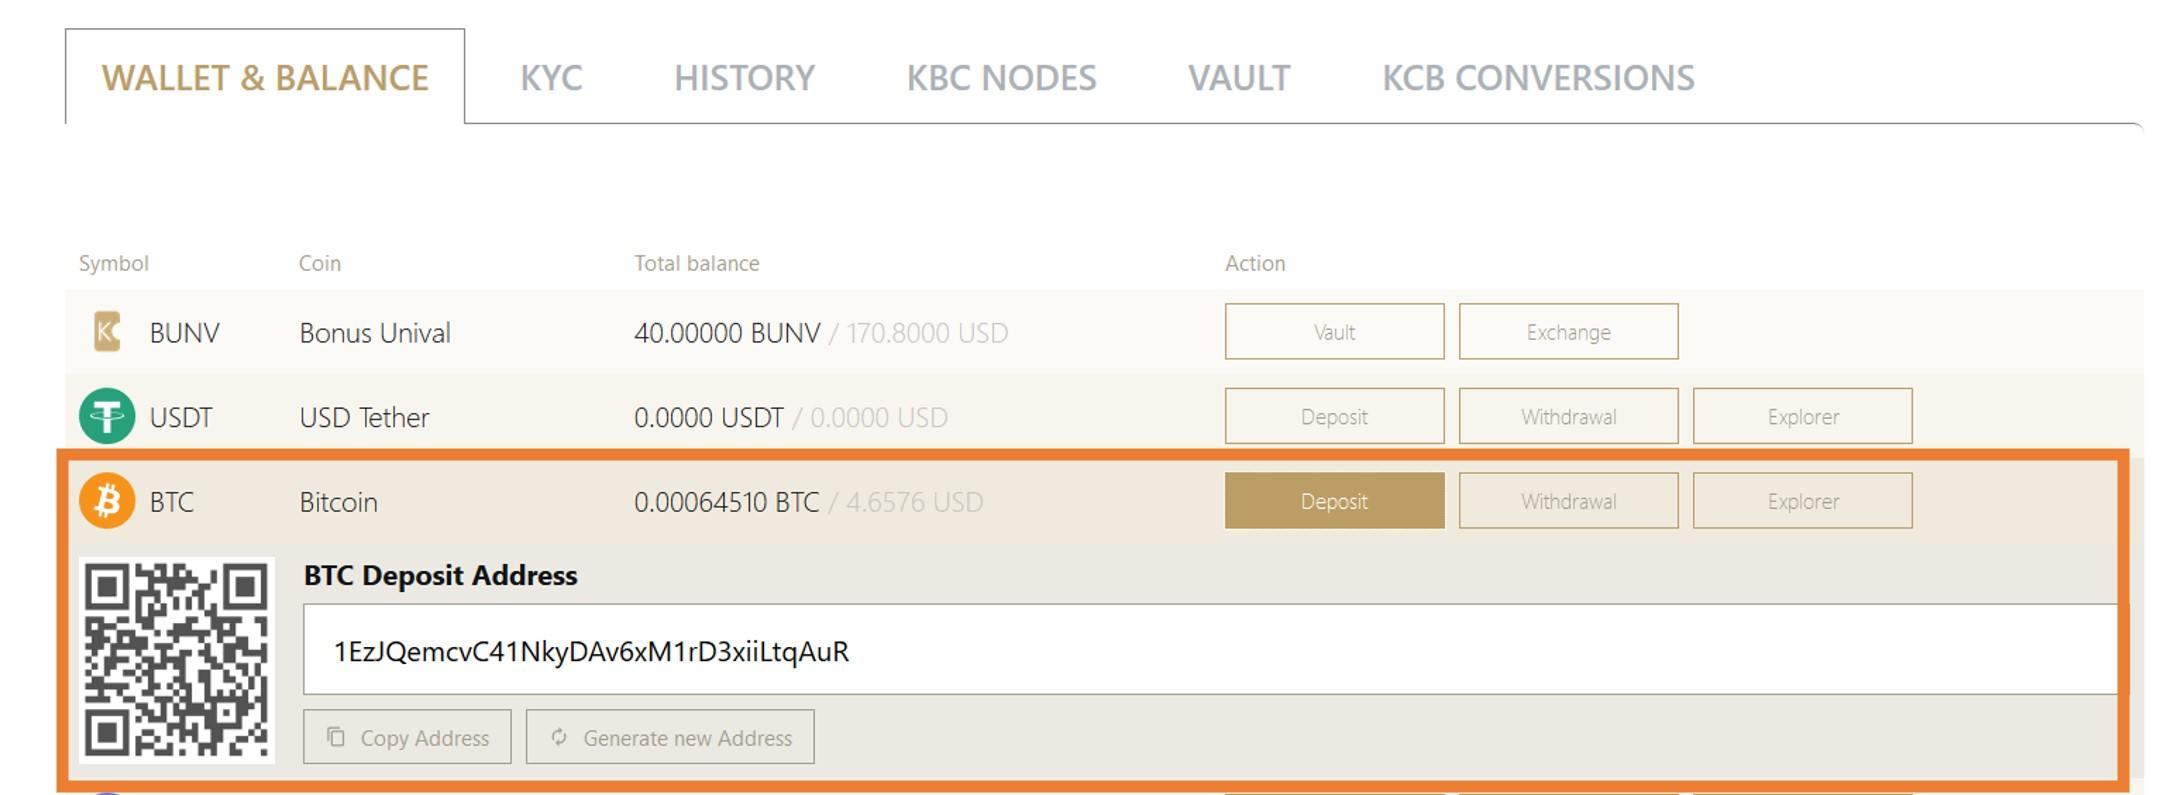 How to buy KBC on Karatbit in spring 2020 (detailed steps & screenshots!)